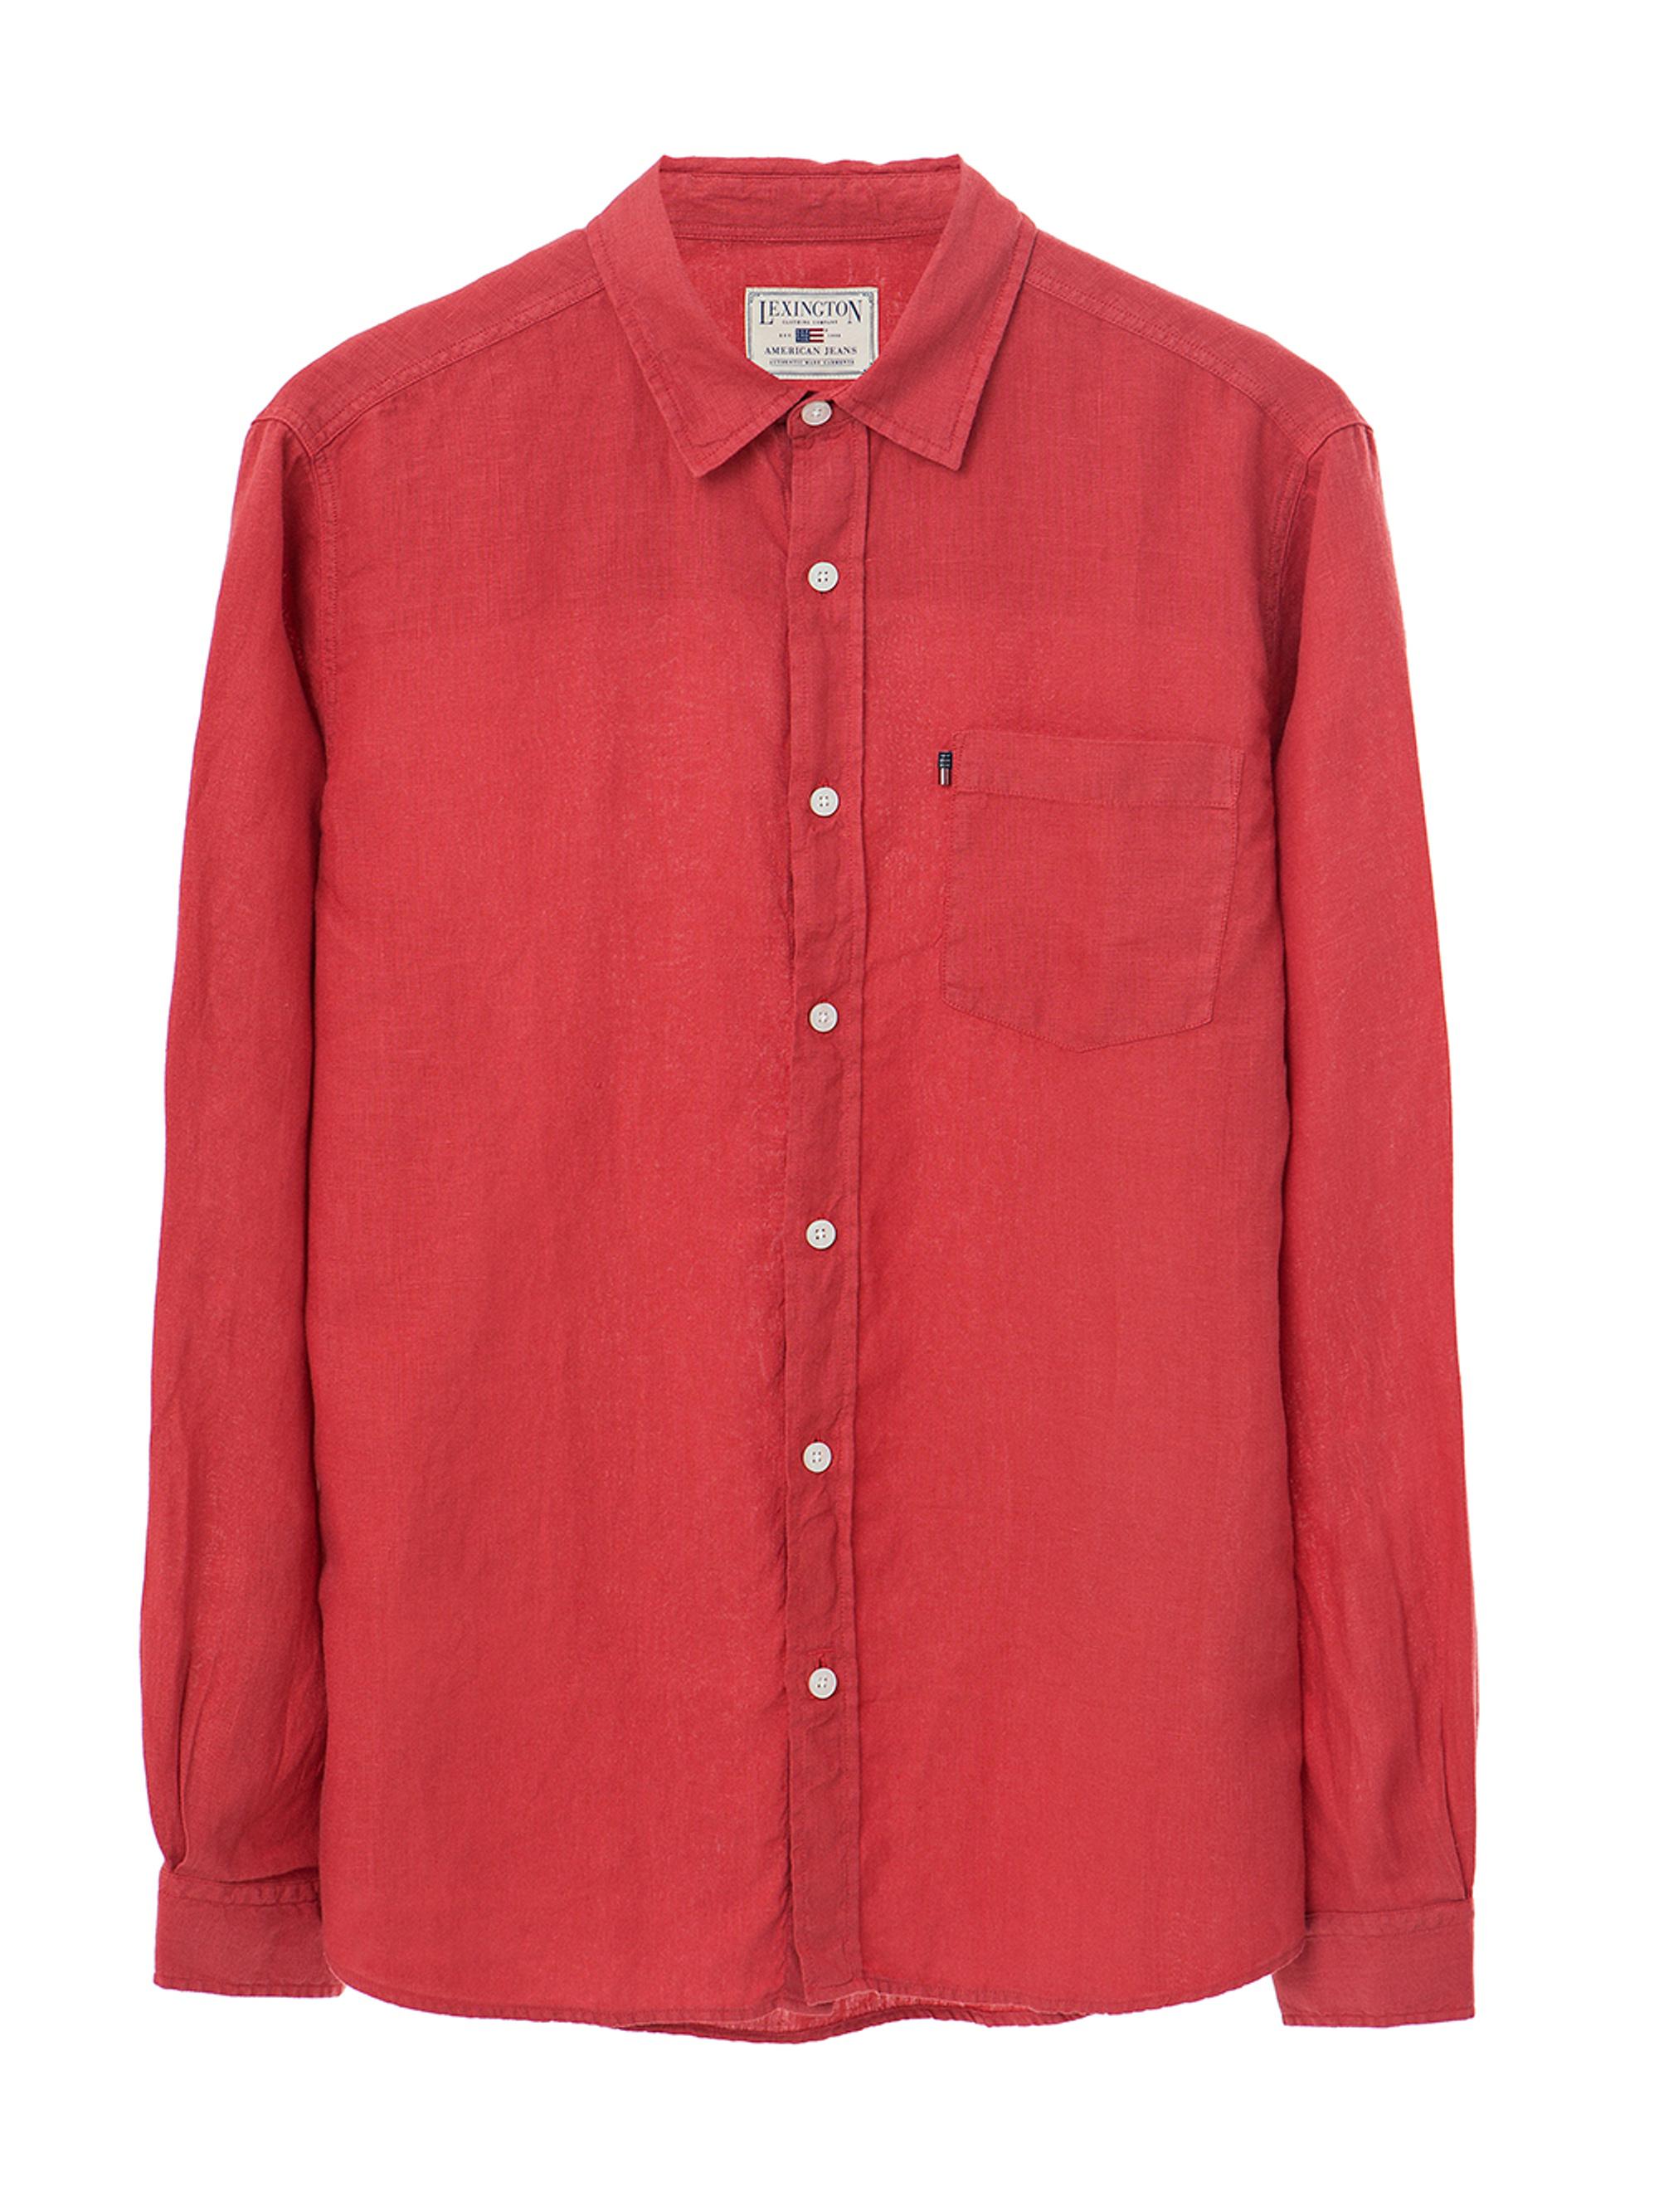 Ryan Linen Shirt, Pompeian Red